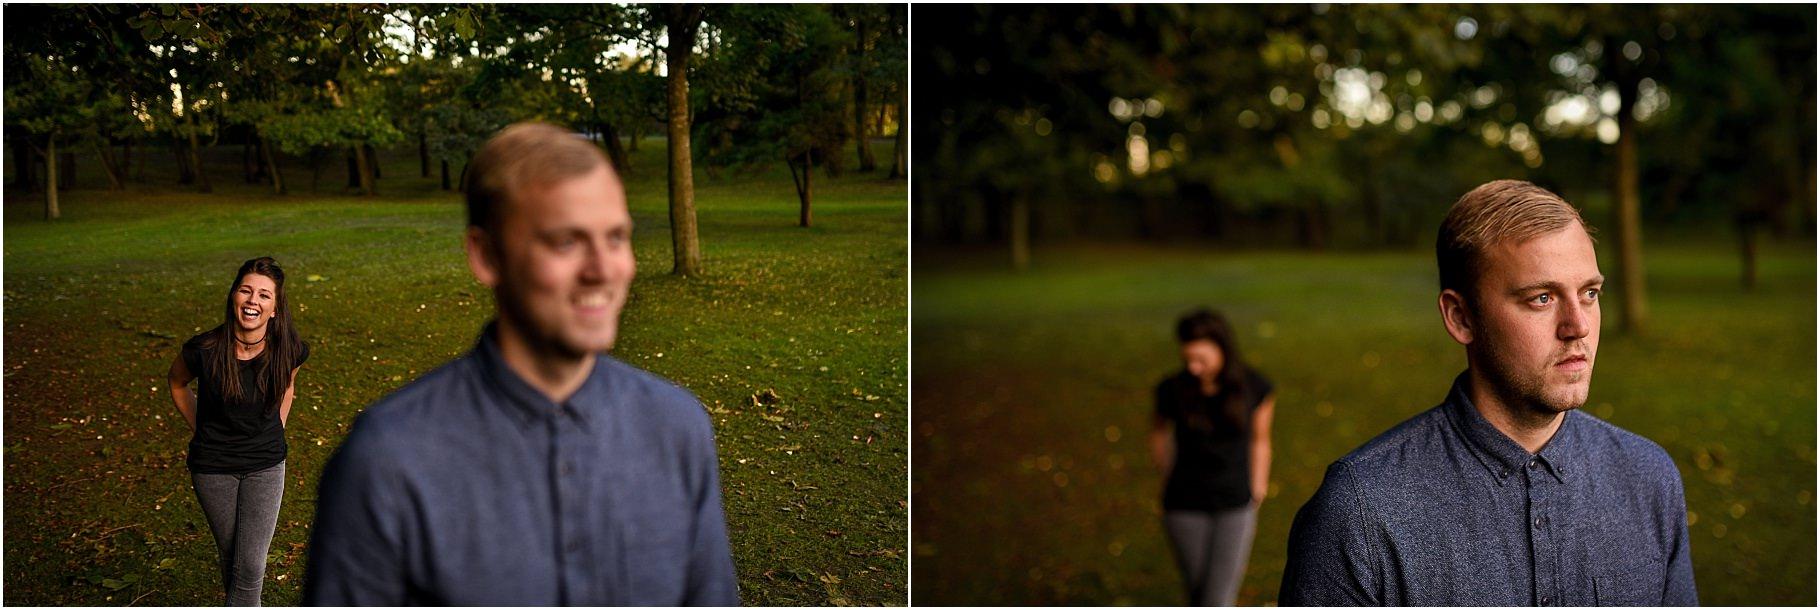 stanley-park-portraits-25.jpg